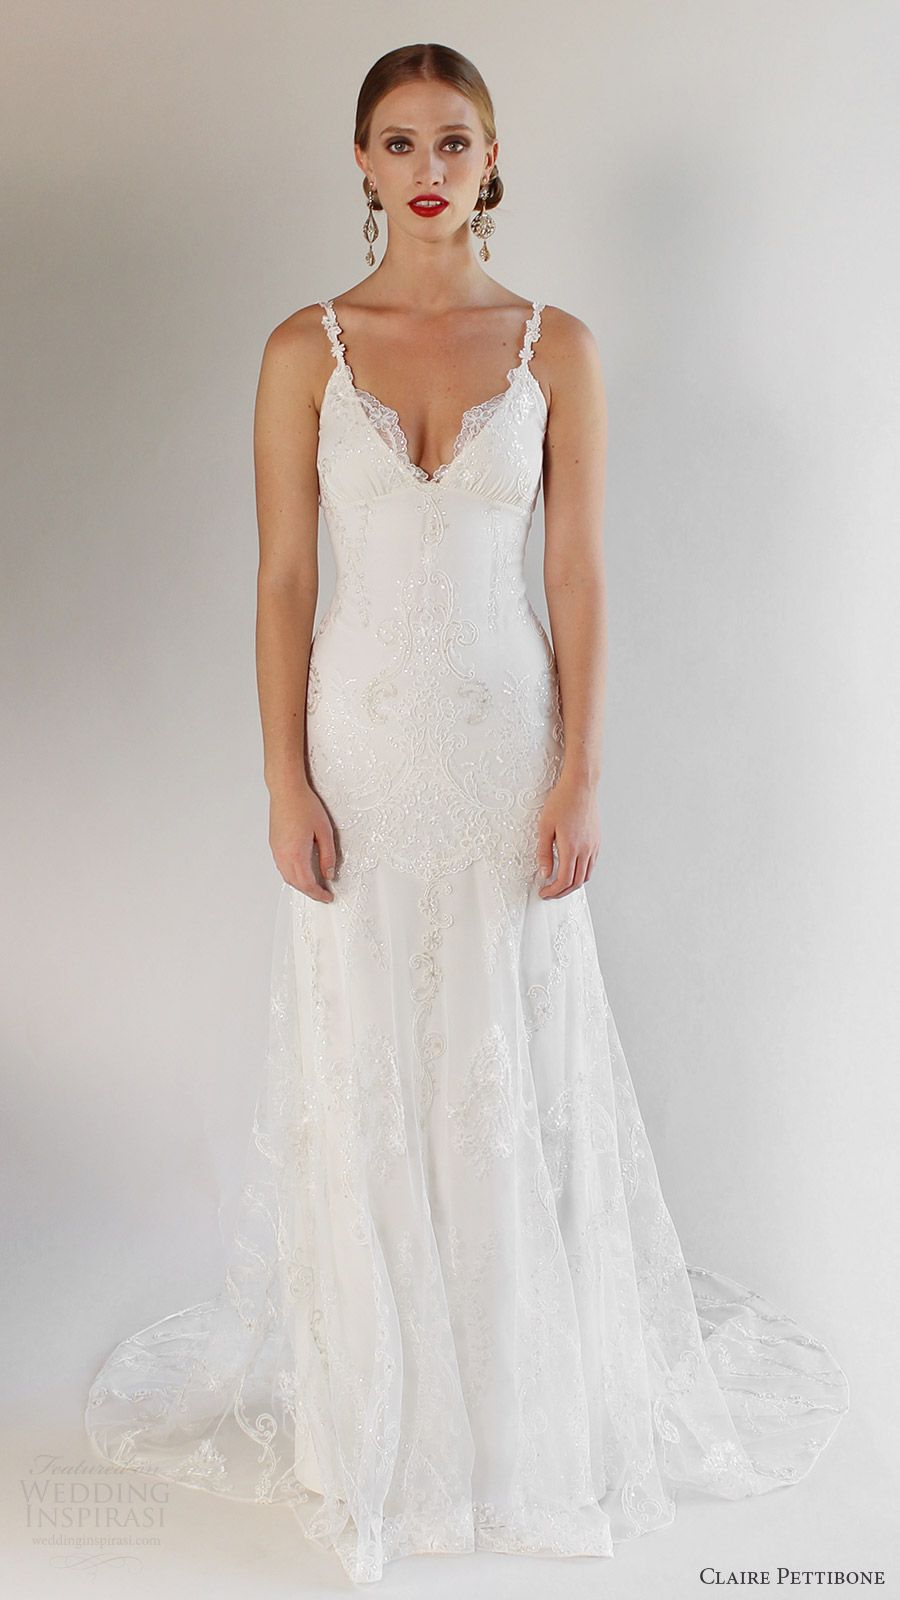 Romantique by claire pettibone spring wedding dresses lace